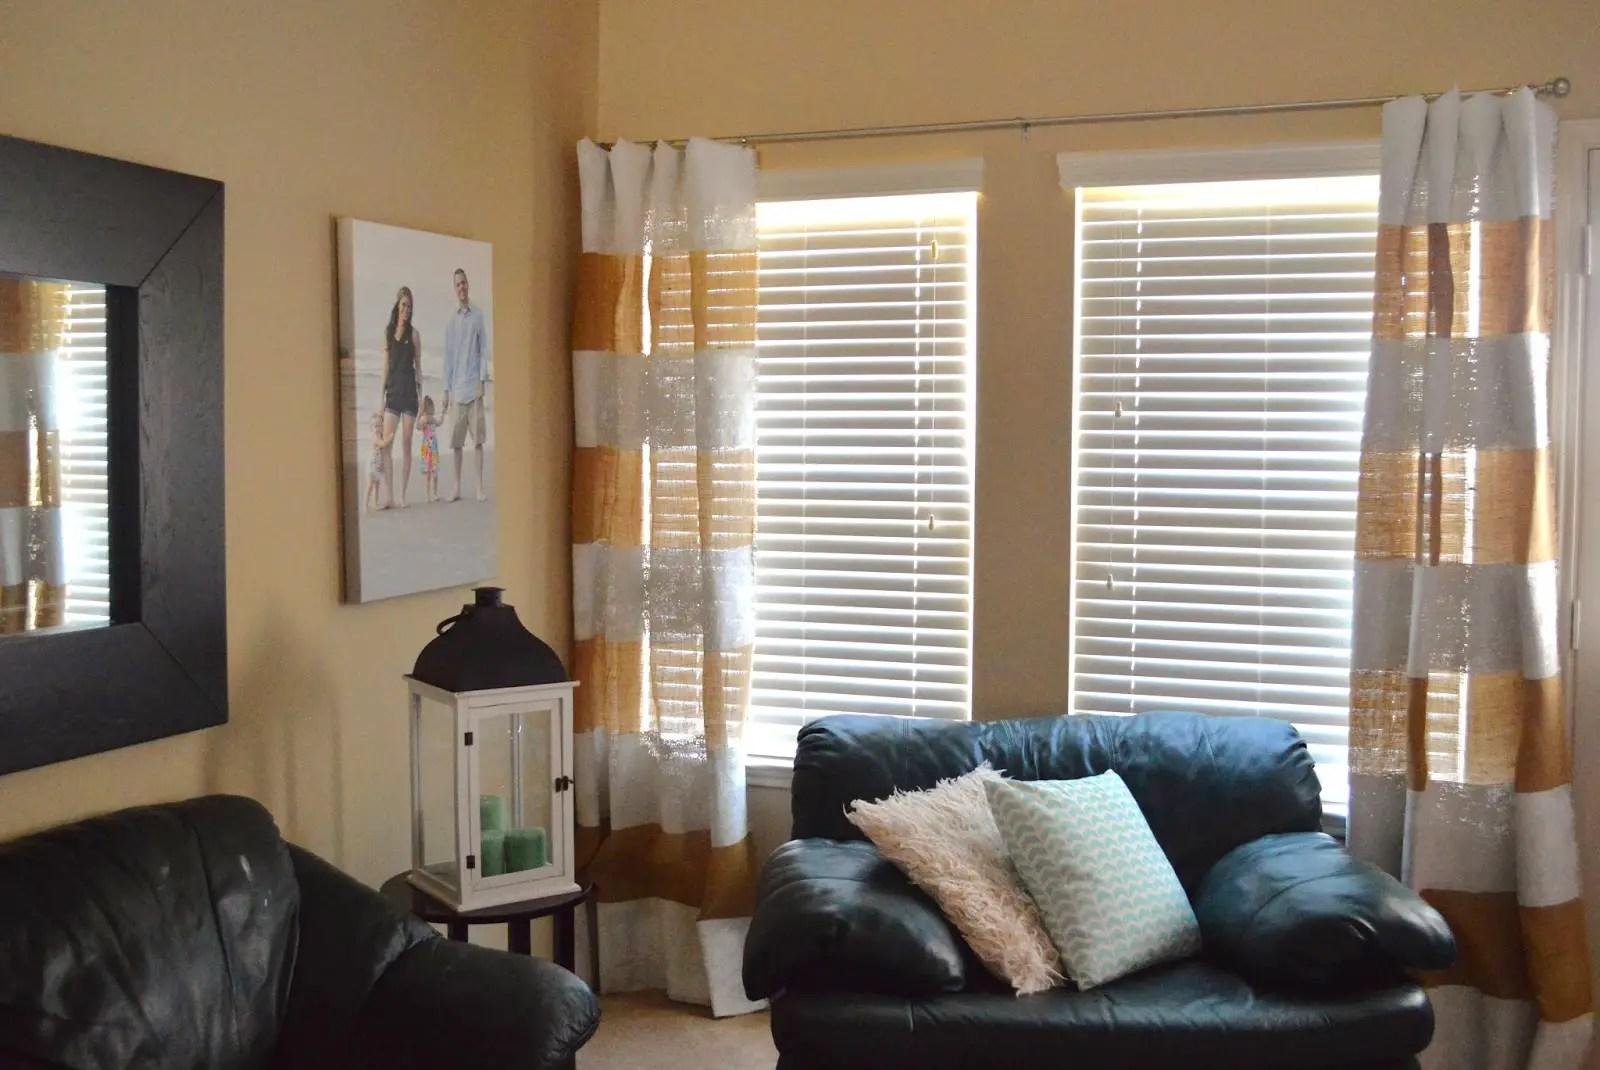 32 DIYs To Make Burlap Curtains Guide Patterns